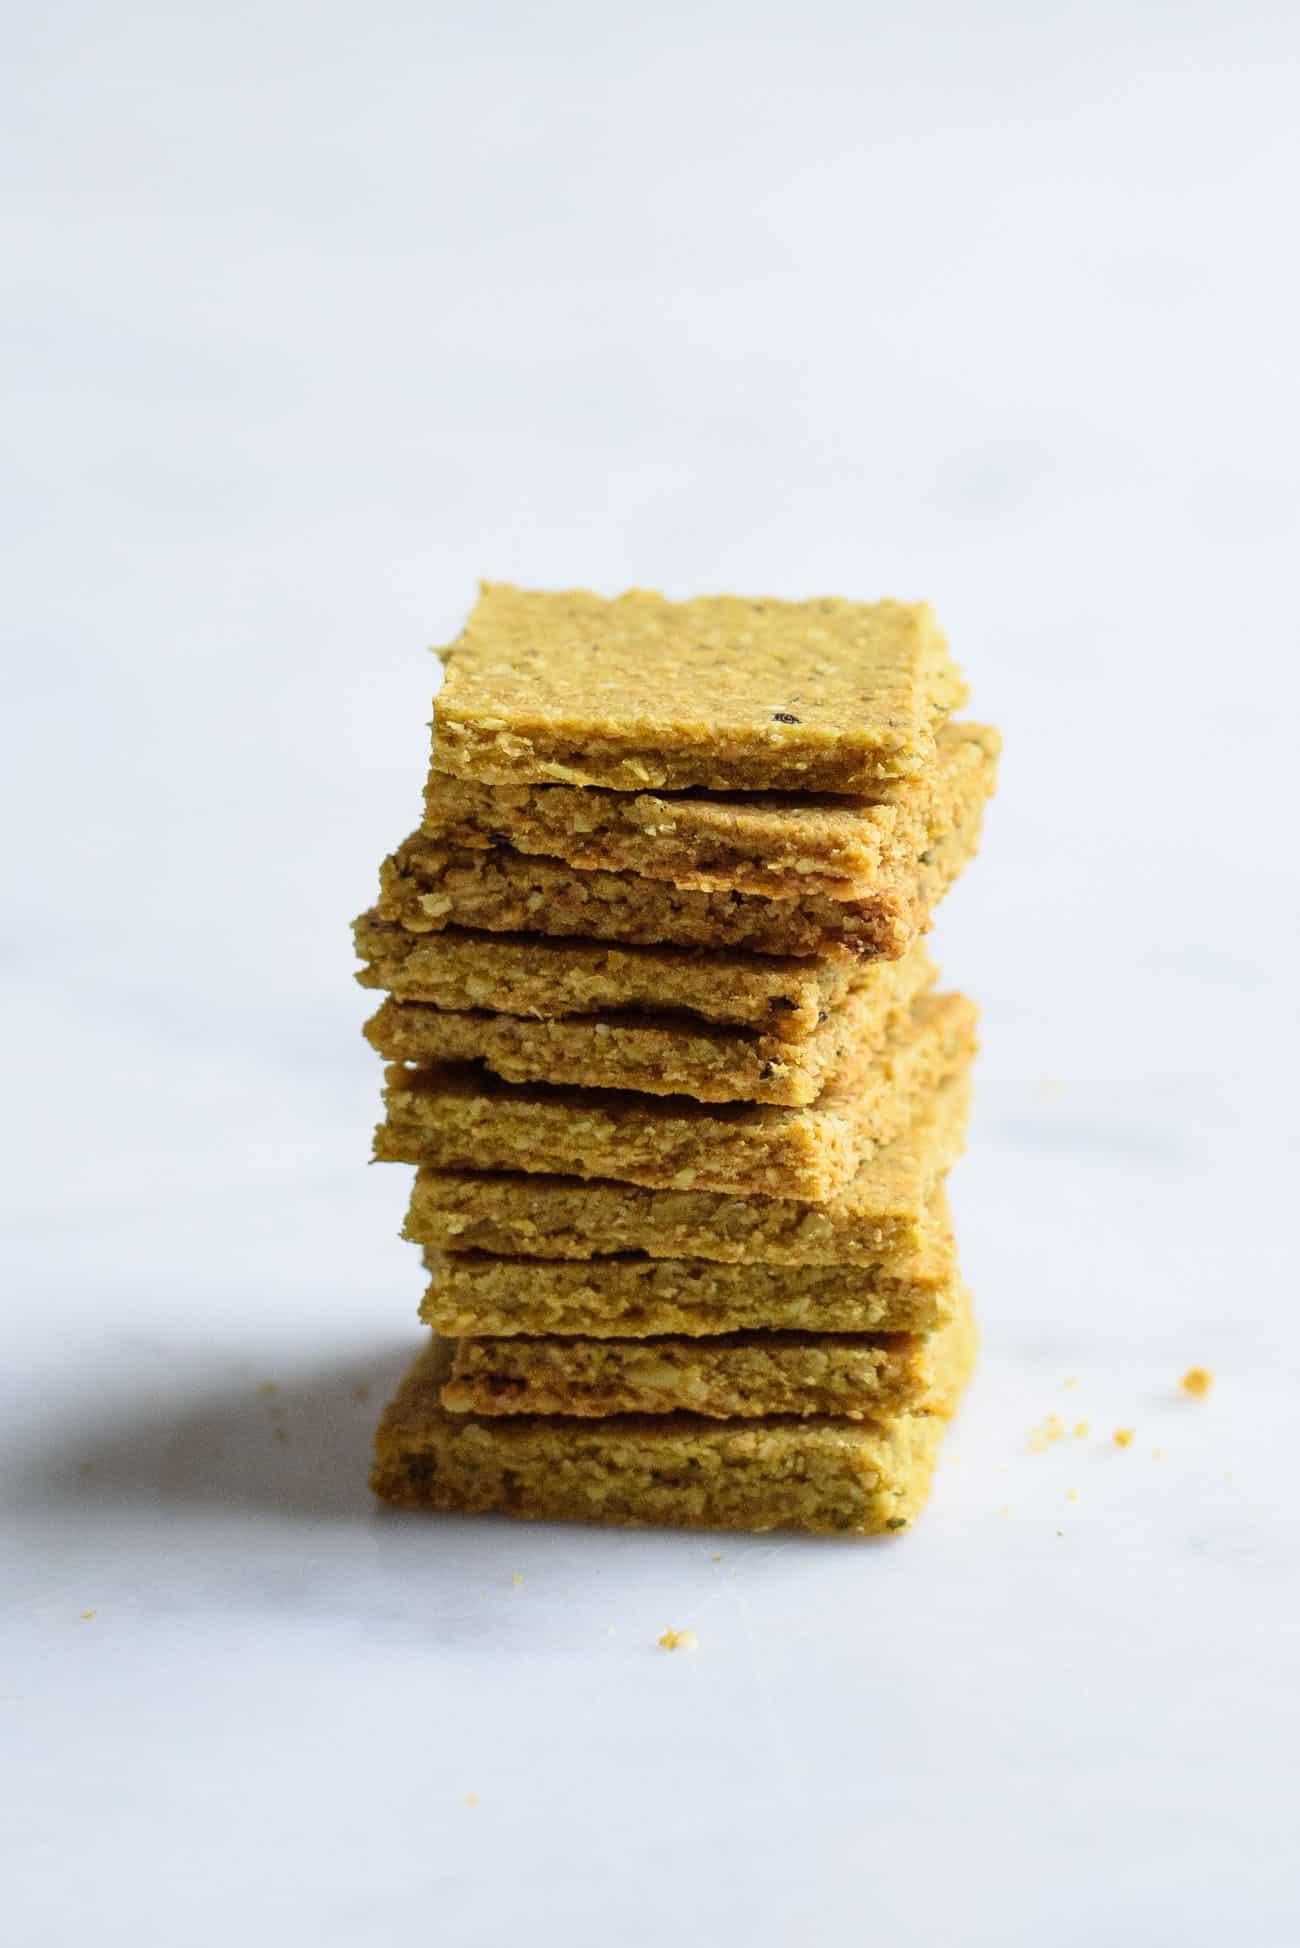 Stack of vegan homemade crackers